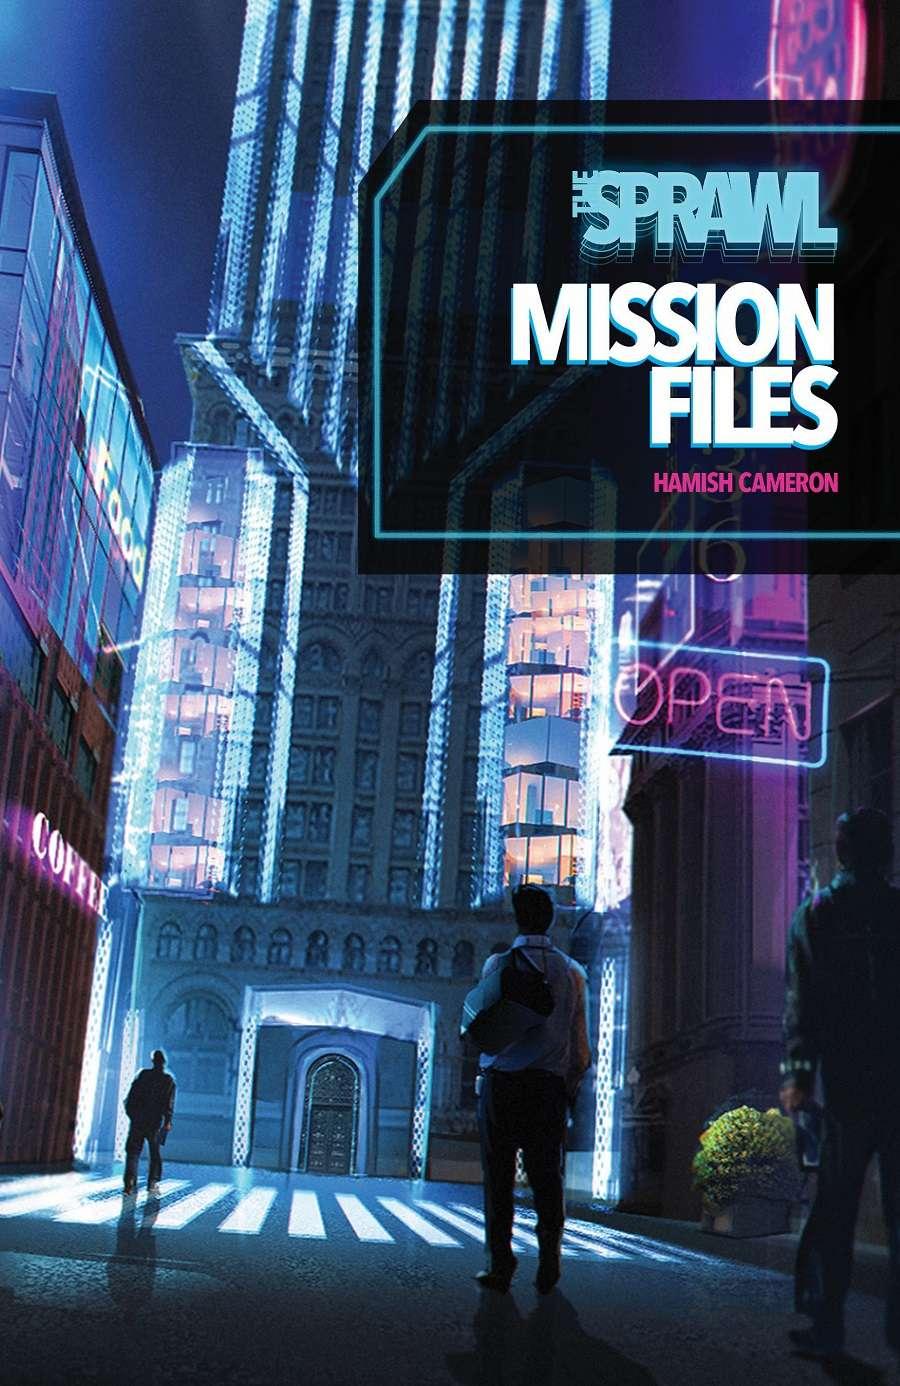 The Sprawl: Mission Files